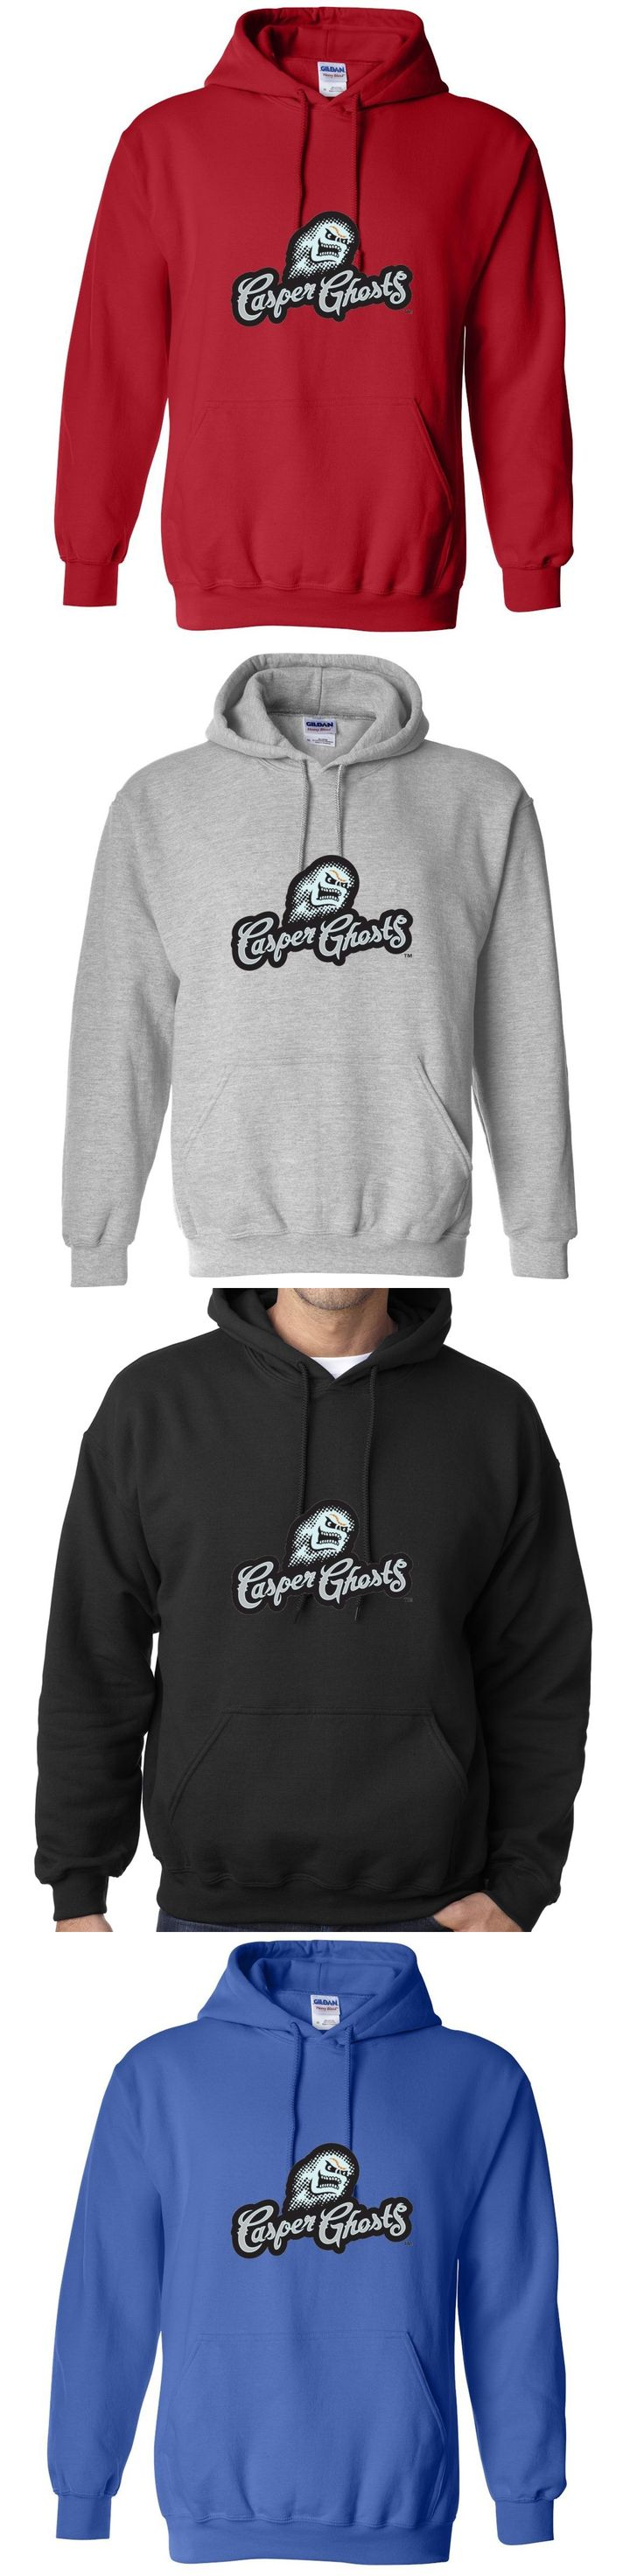 Sweatshirts Hoodies 155194: Baseball Casper Ghosts Logo Hoodie Men S Pullover Fans Sweatshirt New -> BUY IT NOW ONLY: $38.99 on eBay!